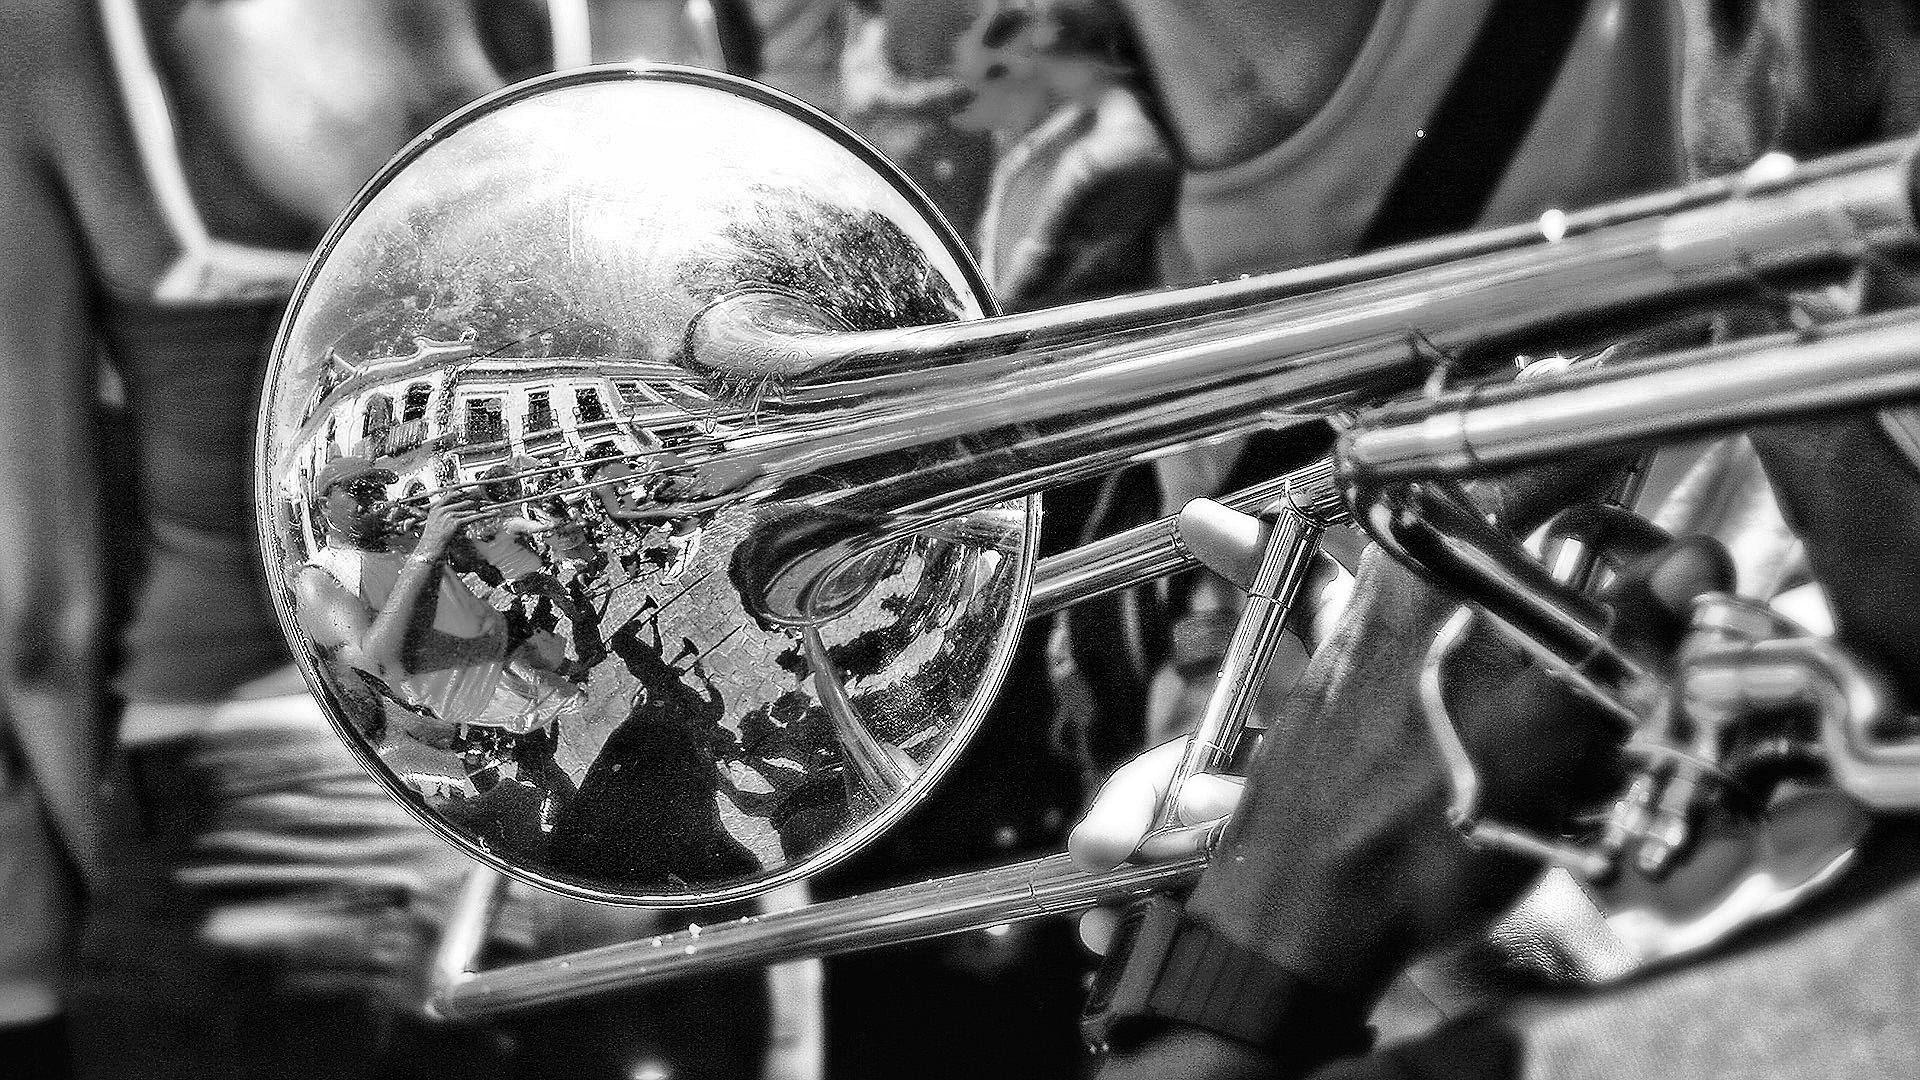 Hd Trombone Wallpaper Trombone Trombone Music Musical Band